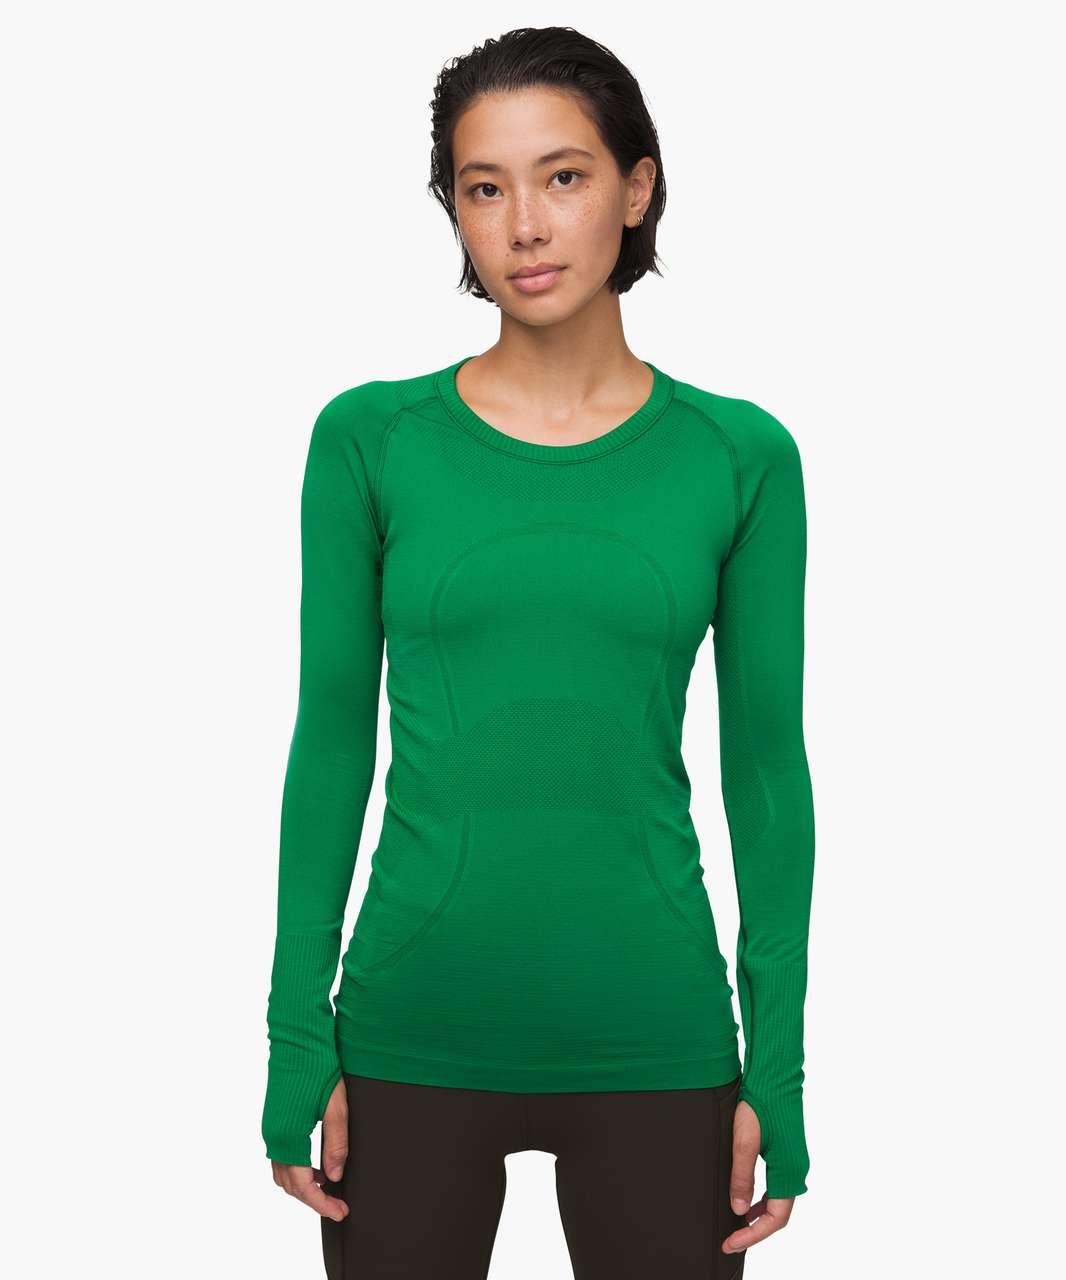 Lululemon Swiftly Tech Long Sleeve Crew - Classic Green / Classic Green